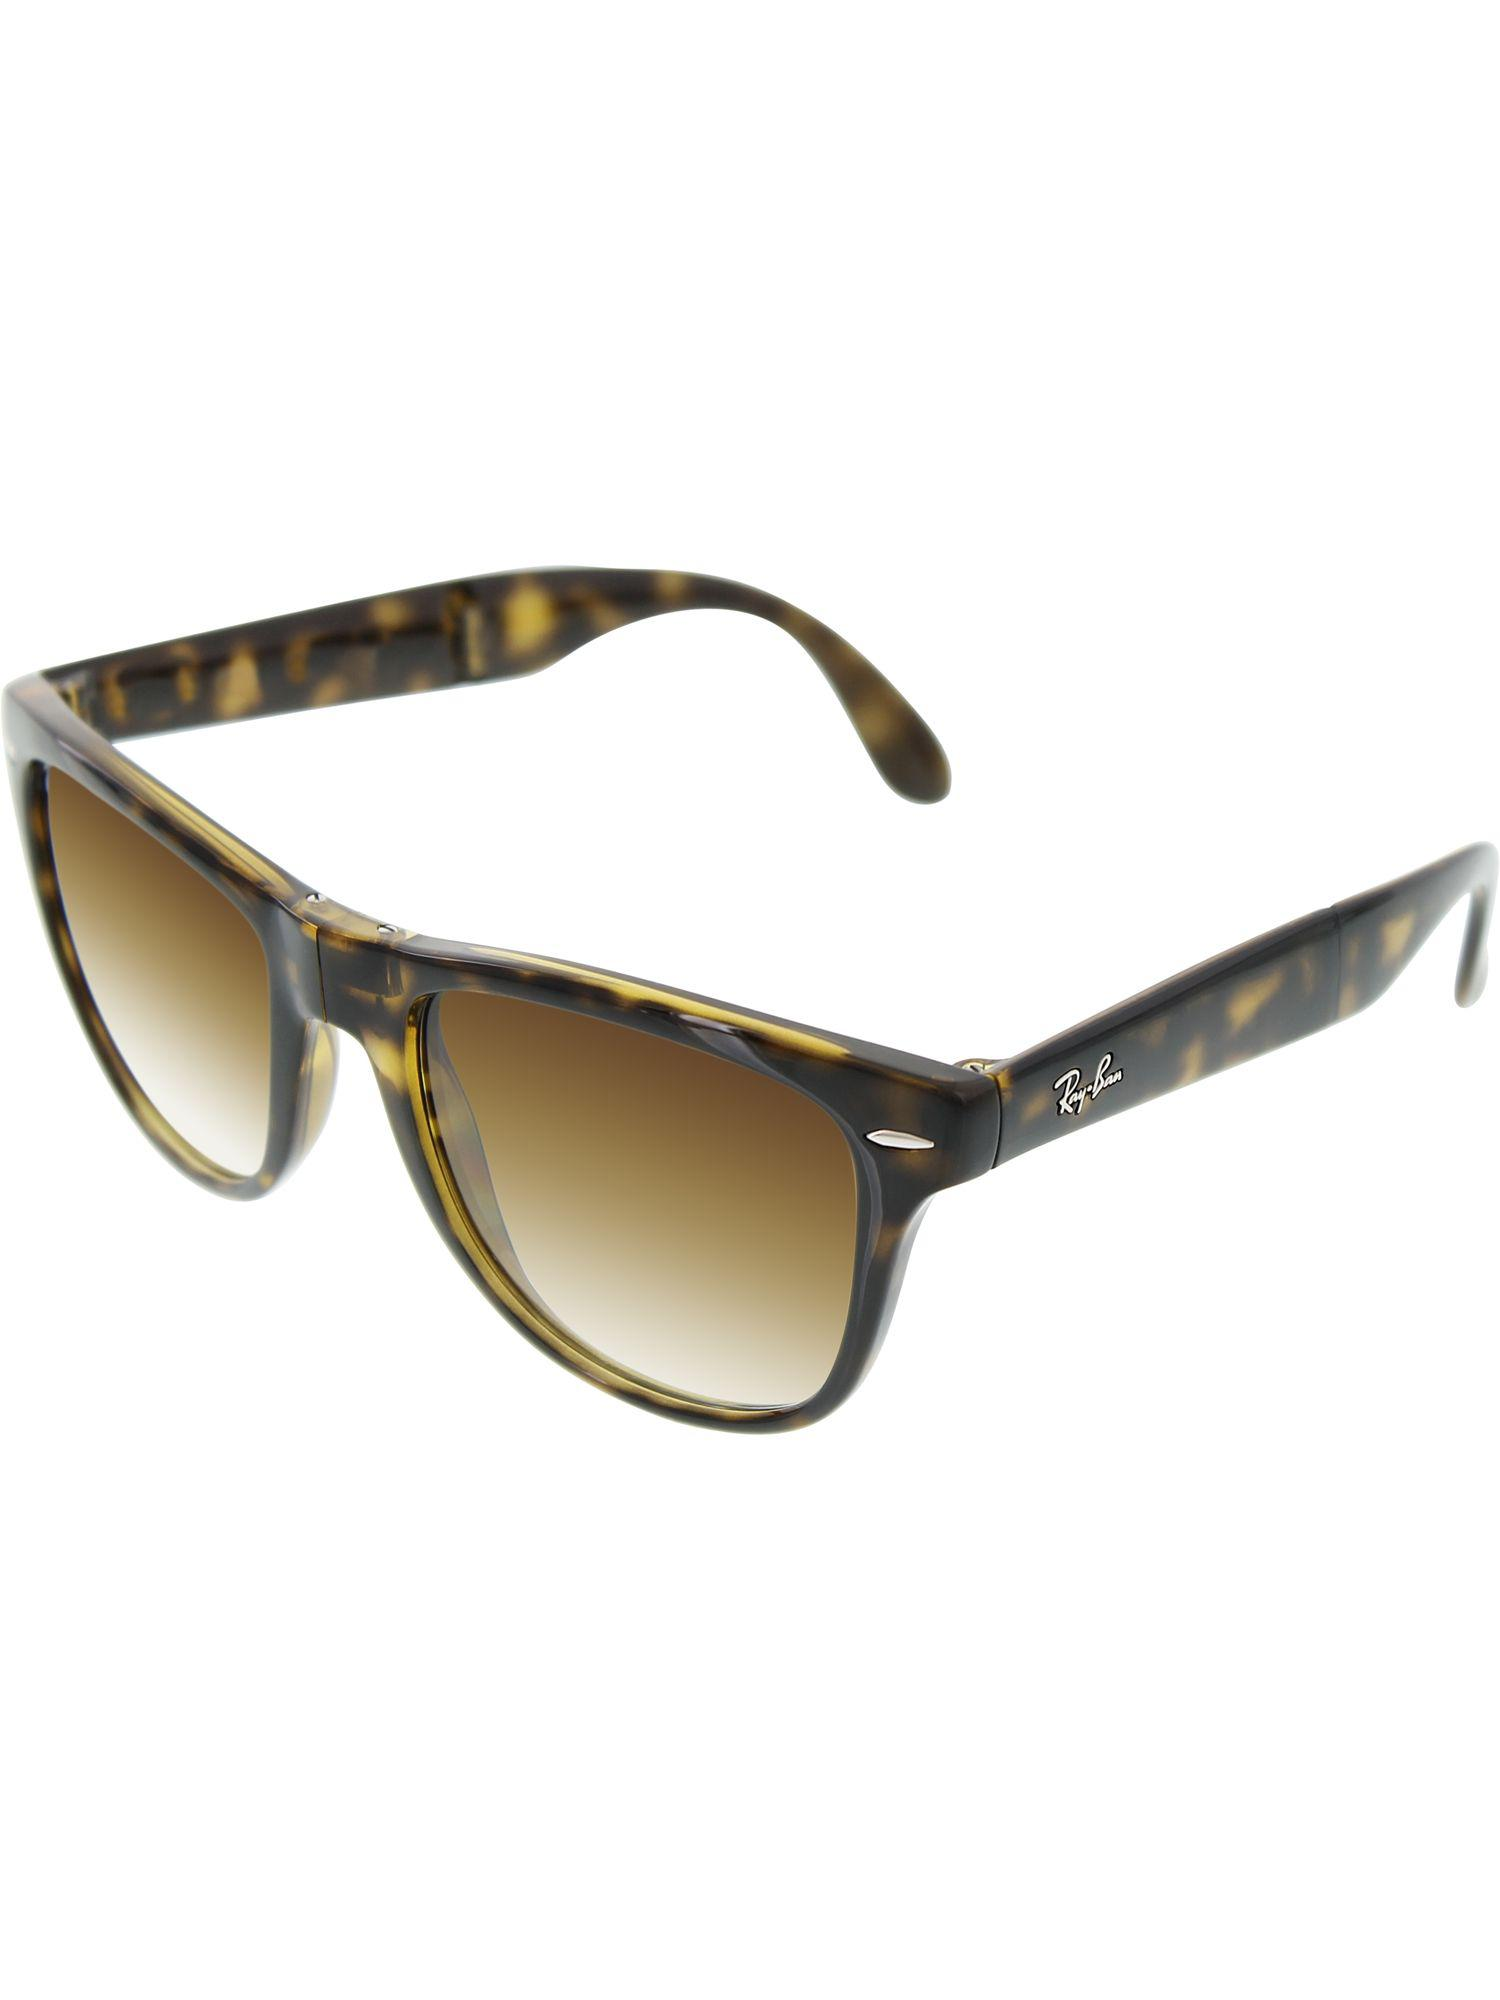 318bfc0f190 Ray-Ban. Women s Gradient Wayfarer Rb4105-710 51-54 Tortoiseshell Sunglasses